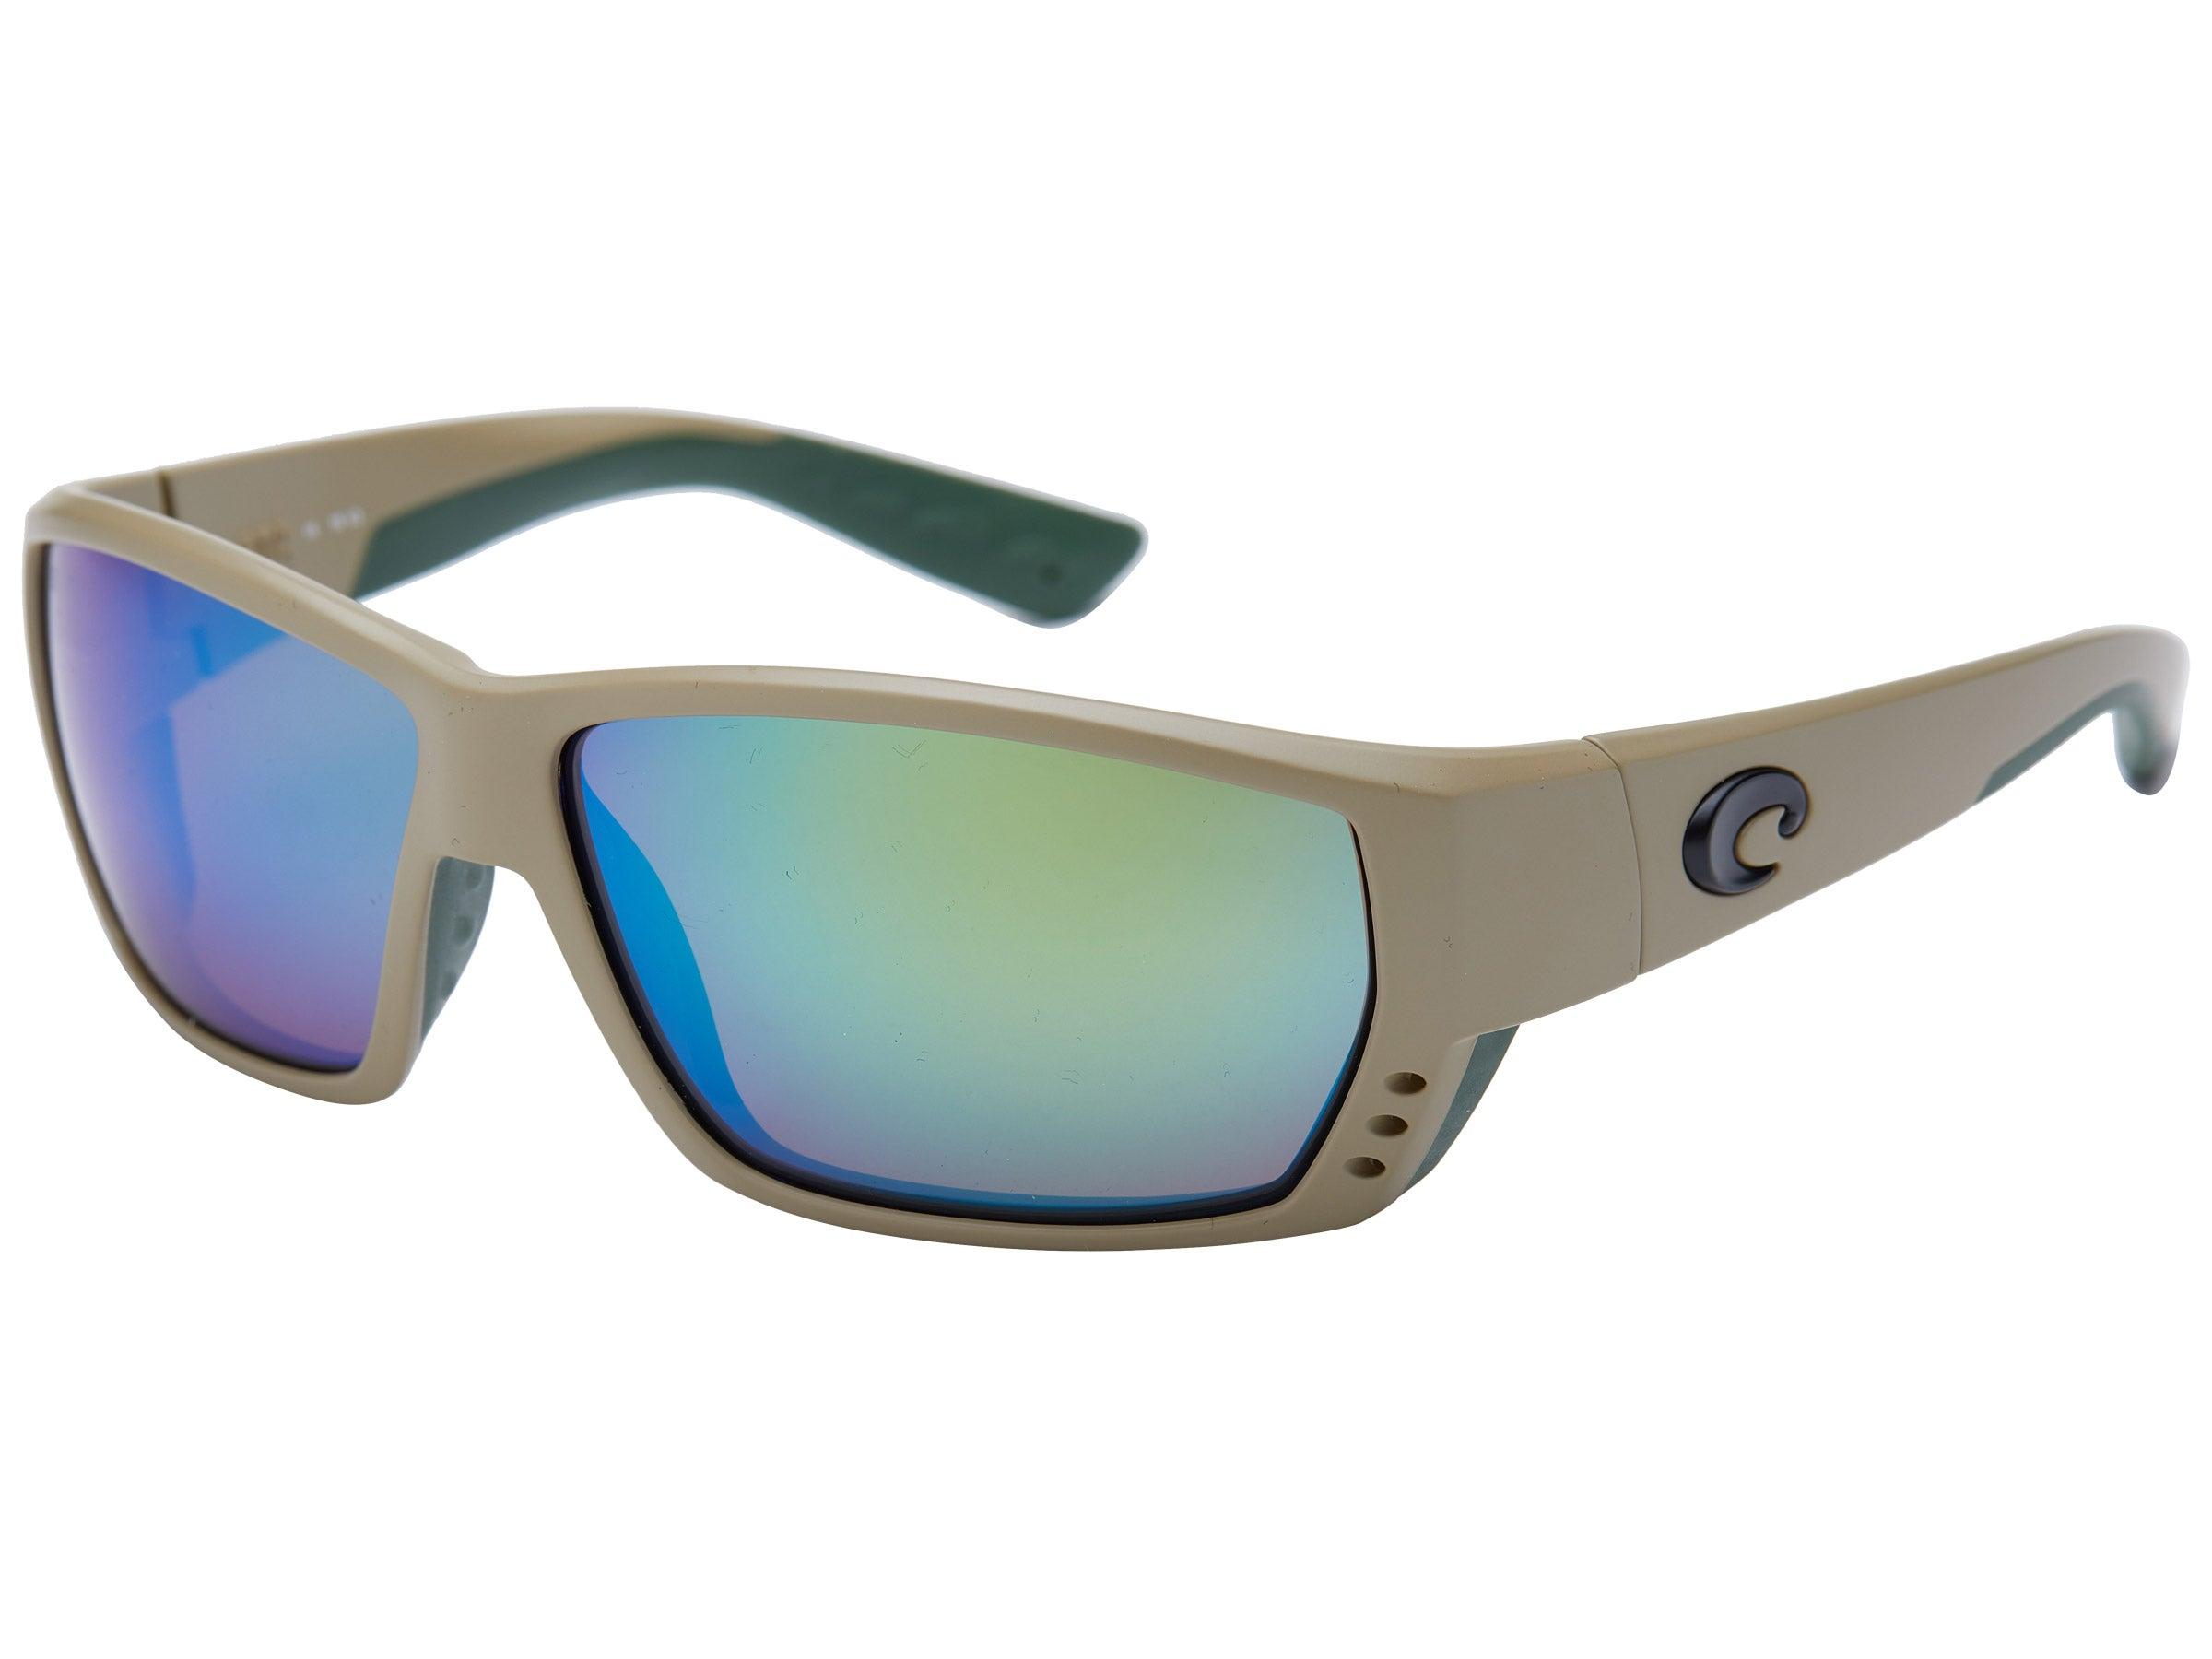 b159d6bdd8 Costa Del Mar Tuna Alley Sunglasses